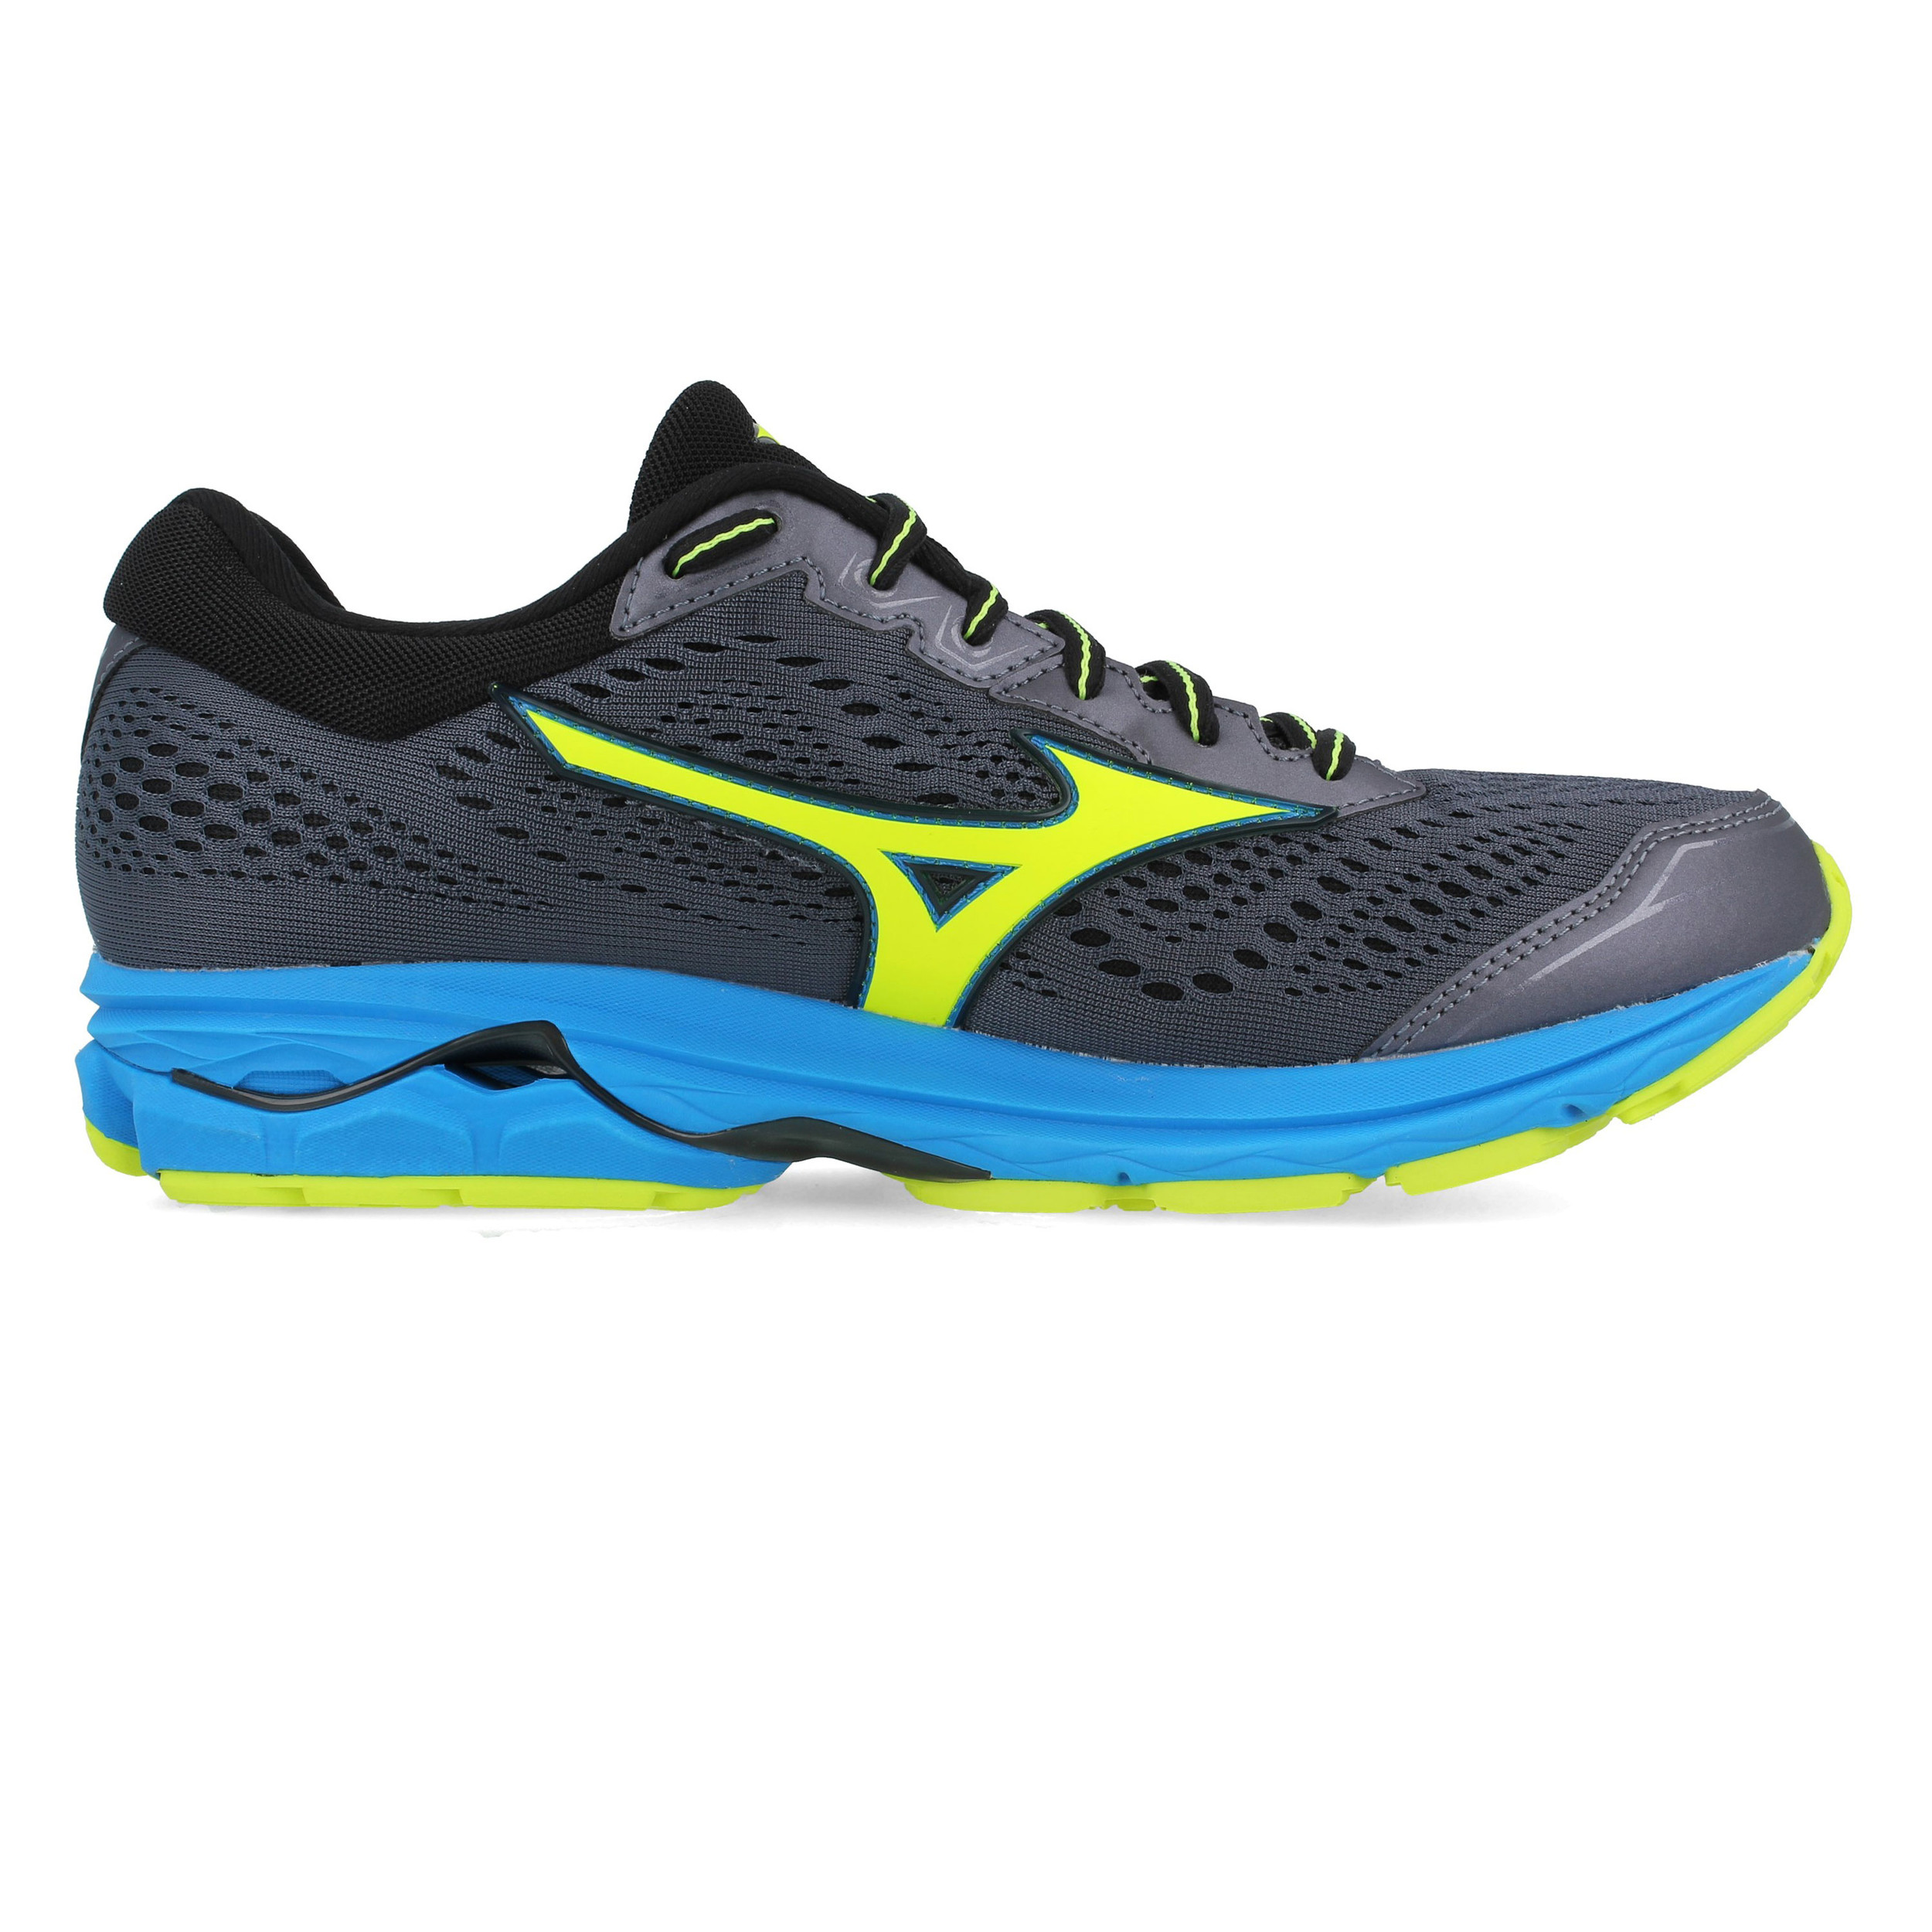 Jogging Grau Turnschuhe Laufschuhe Zu Sneaker Herren Rider Schuhe Mizuno Details Wave 22 67gybf